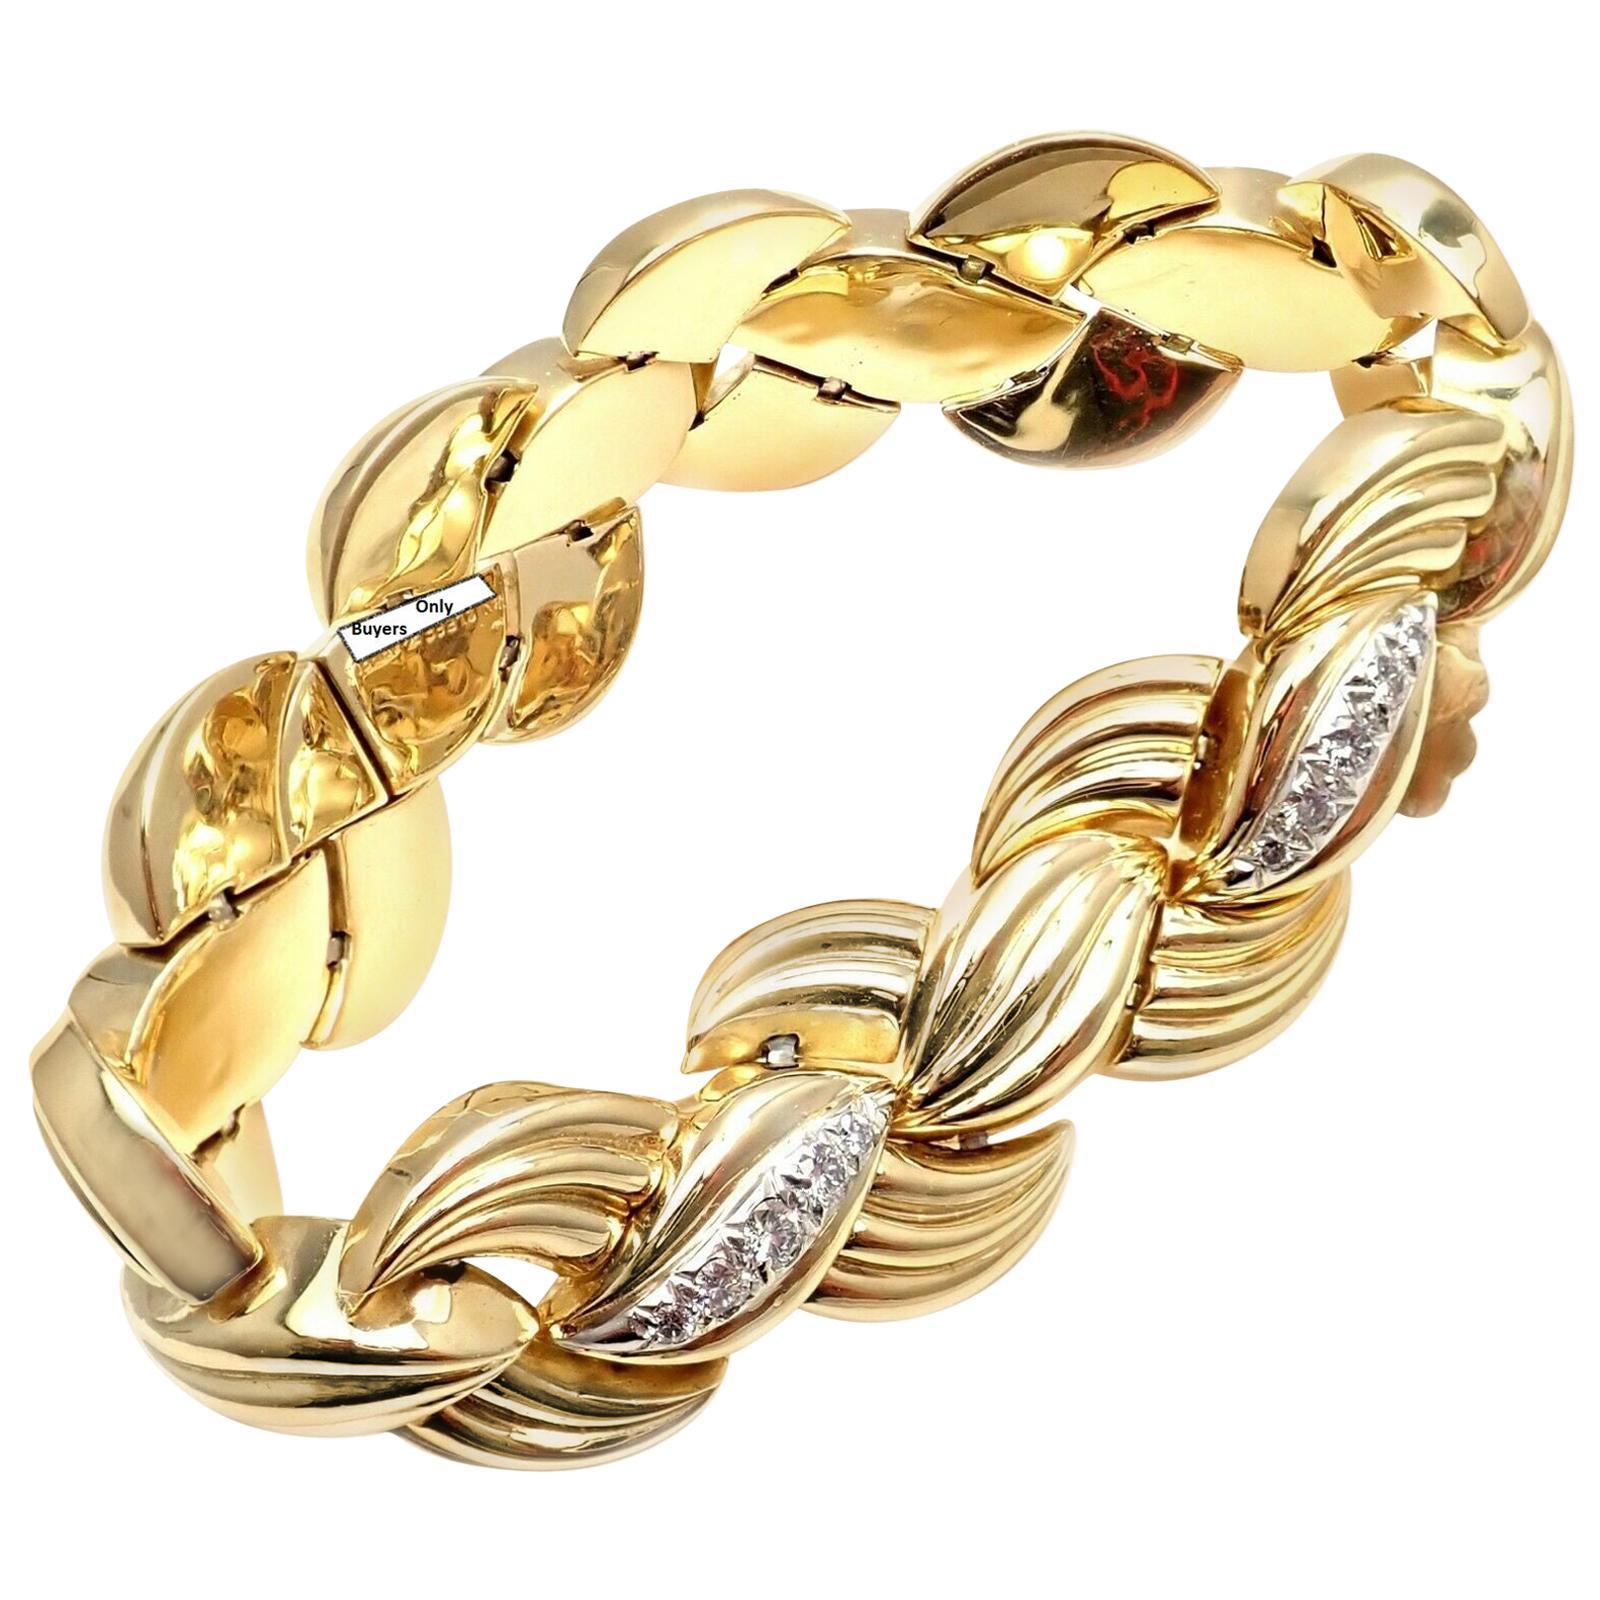 Vintage Van Cleef & Arpels Diamond Link Yellow Gold Bracelet